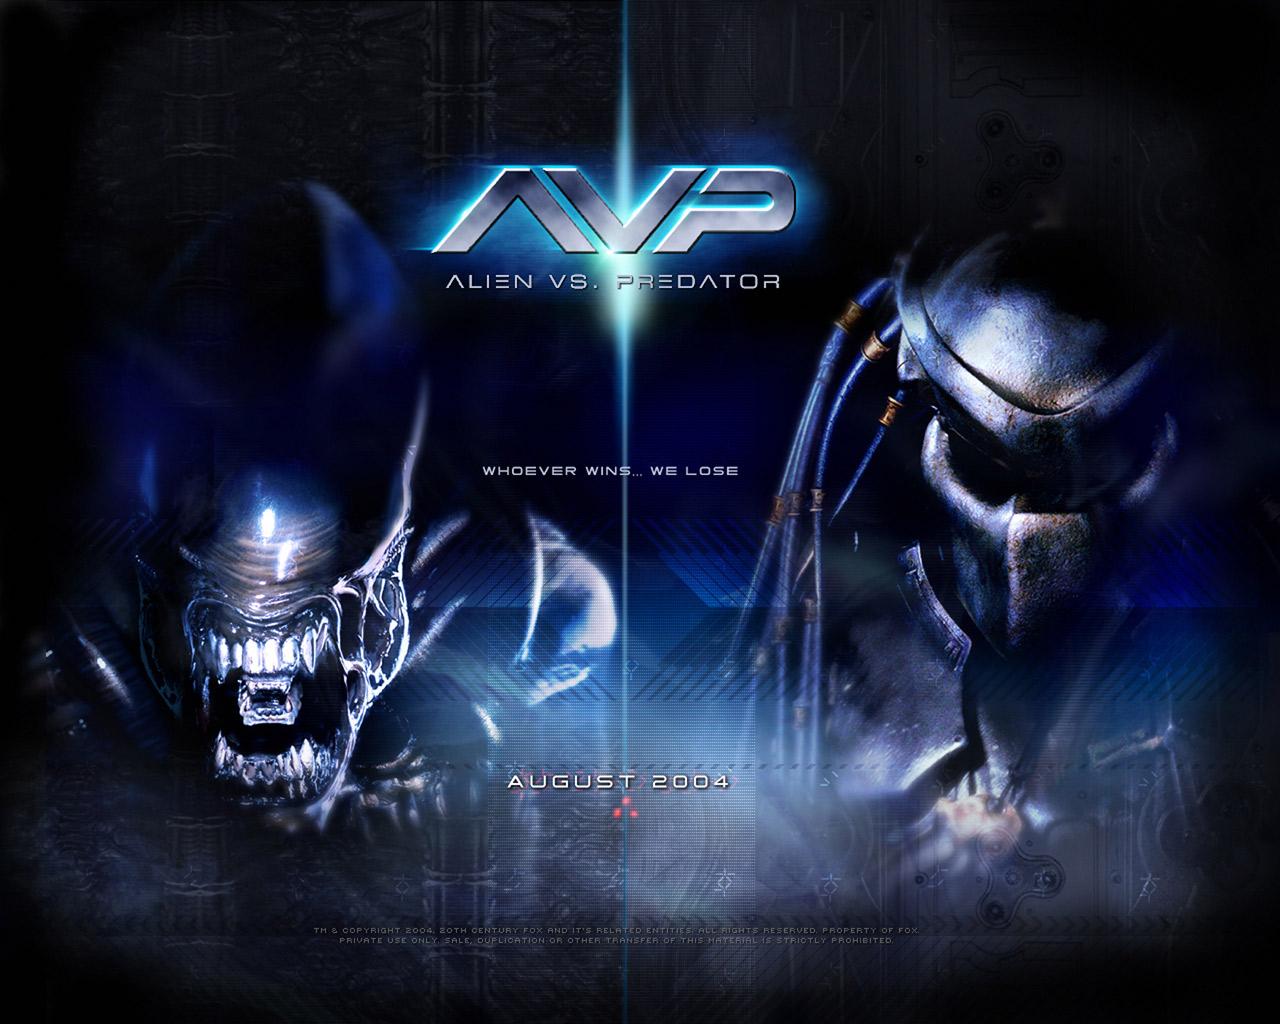 Alien Vs Predator Avp Wallpaper 1280x1024 25241